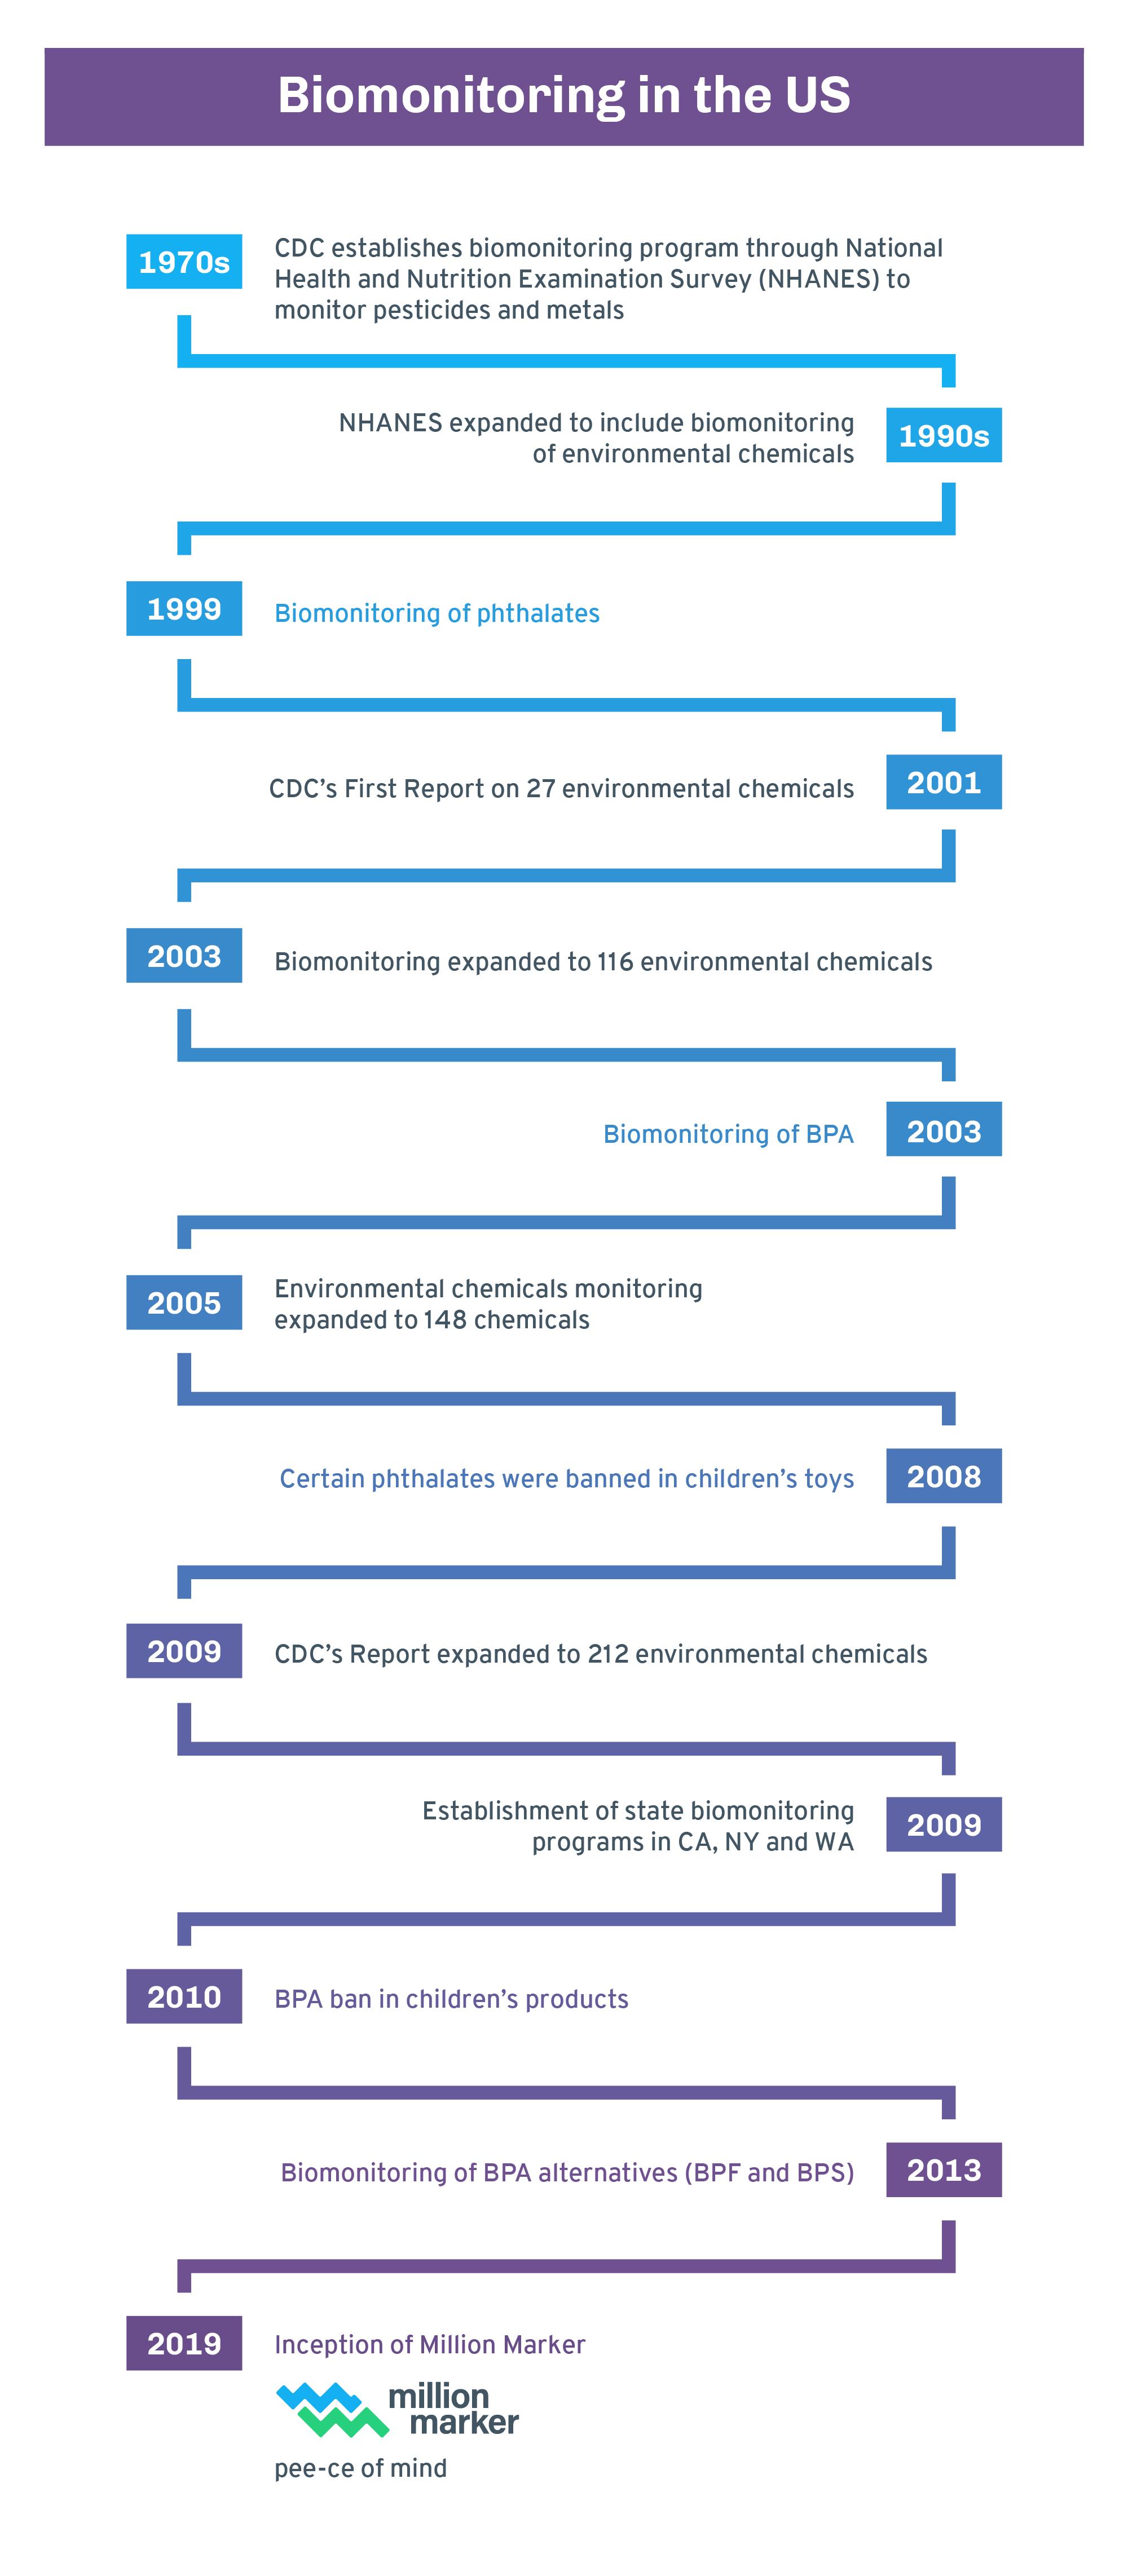 biomonitoring-timeline.png